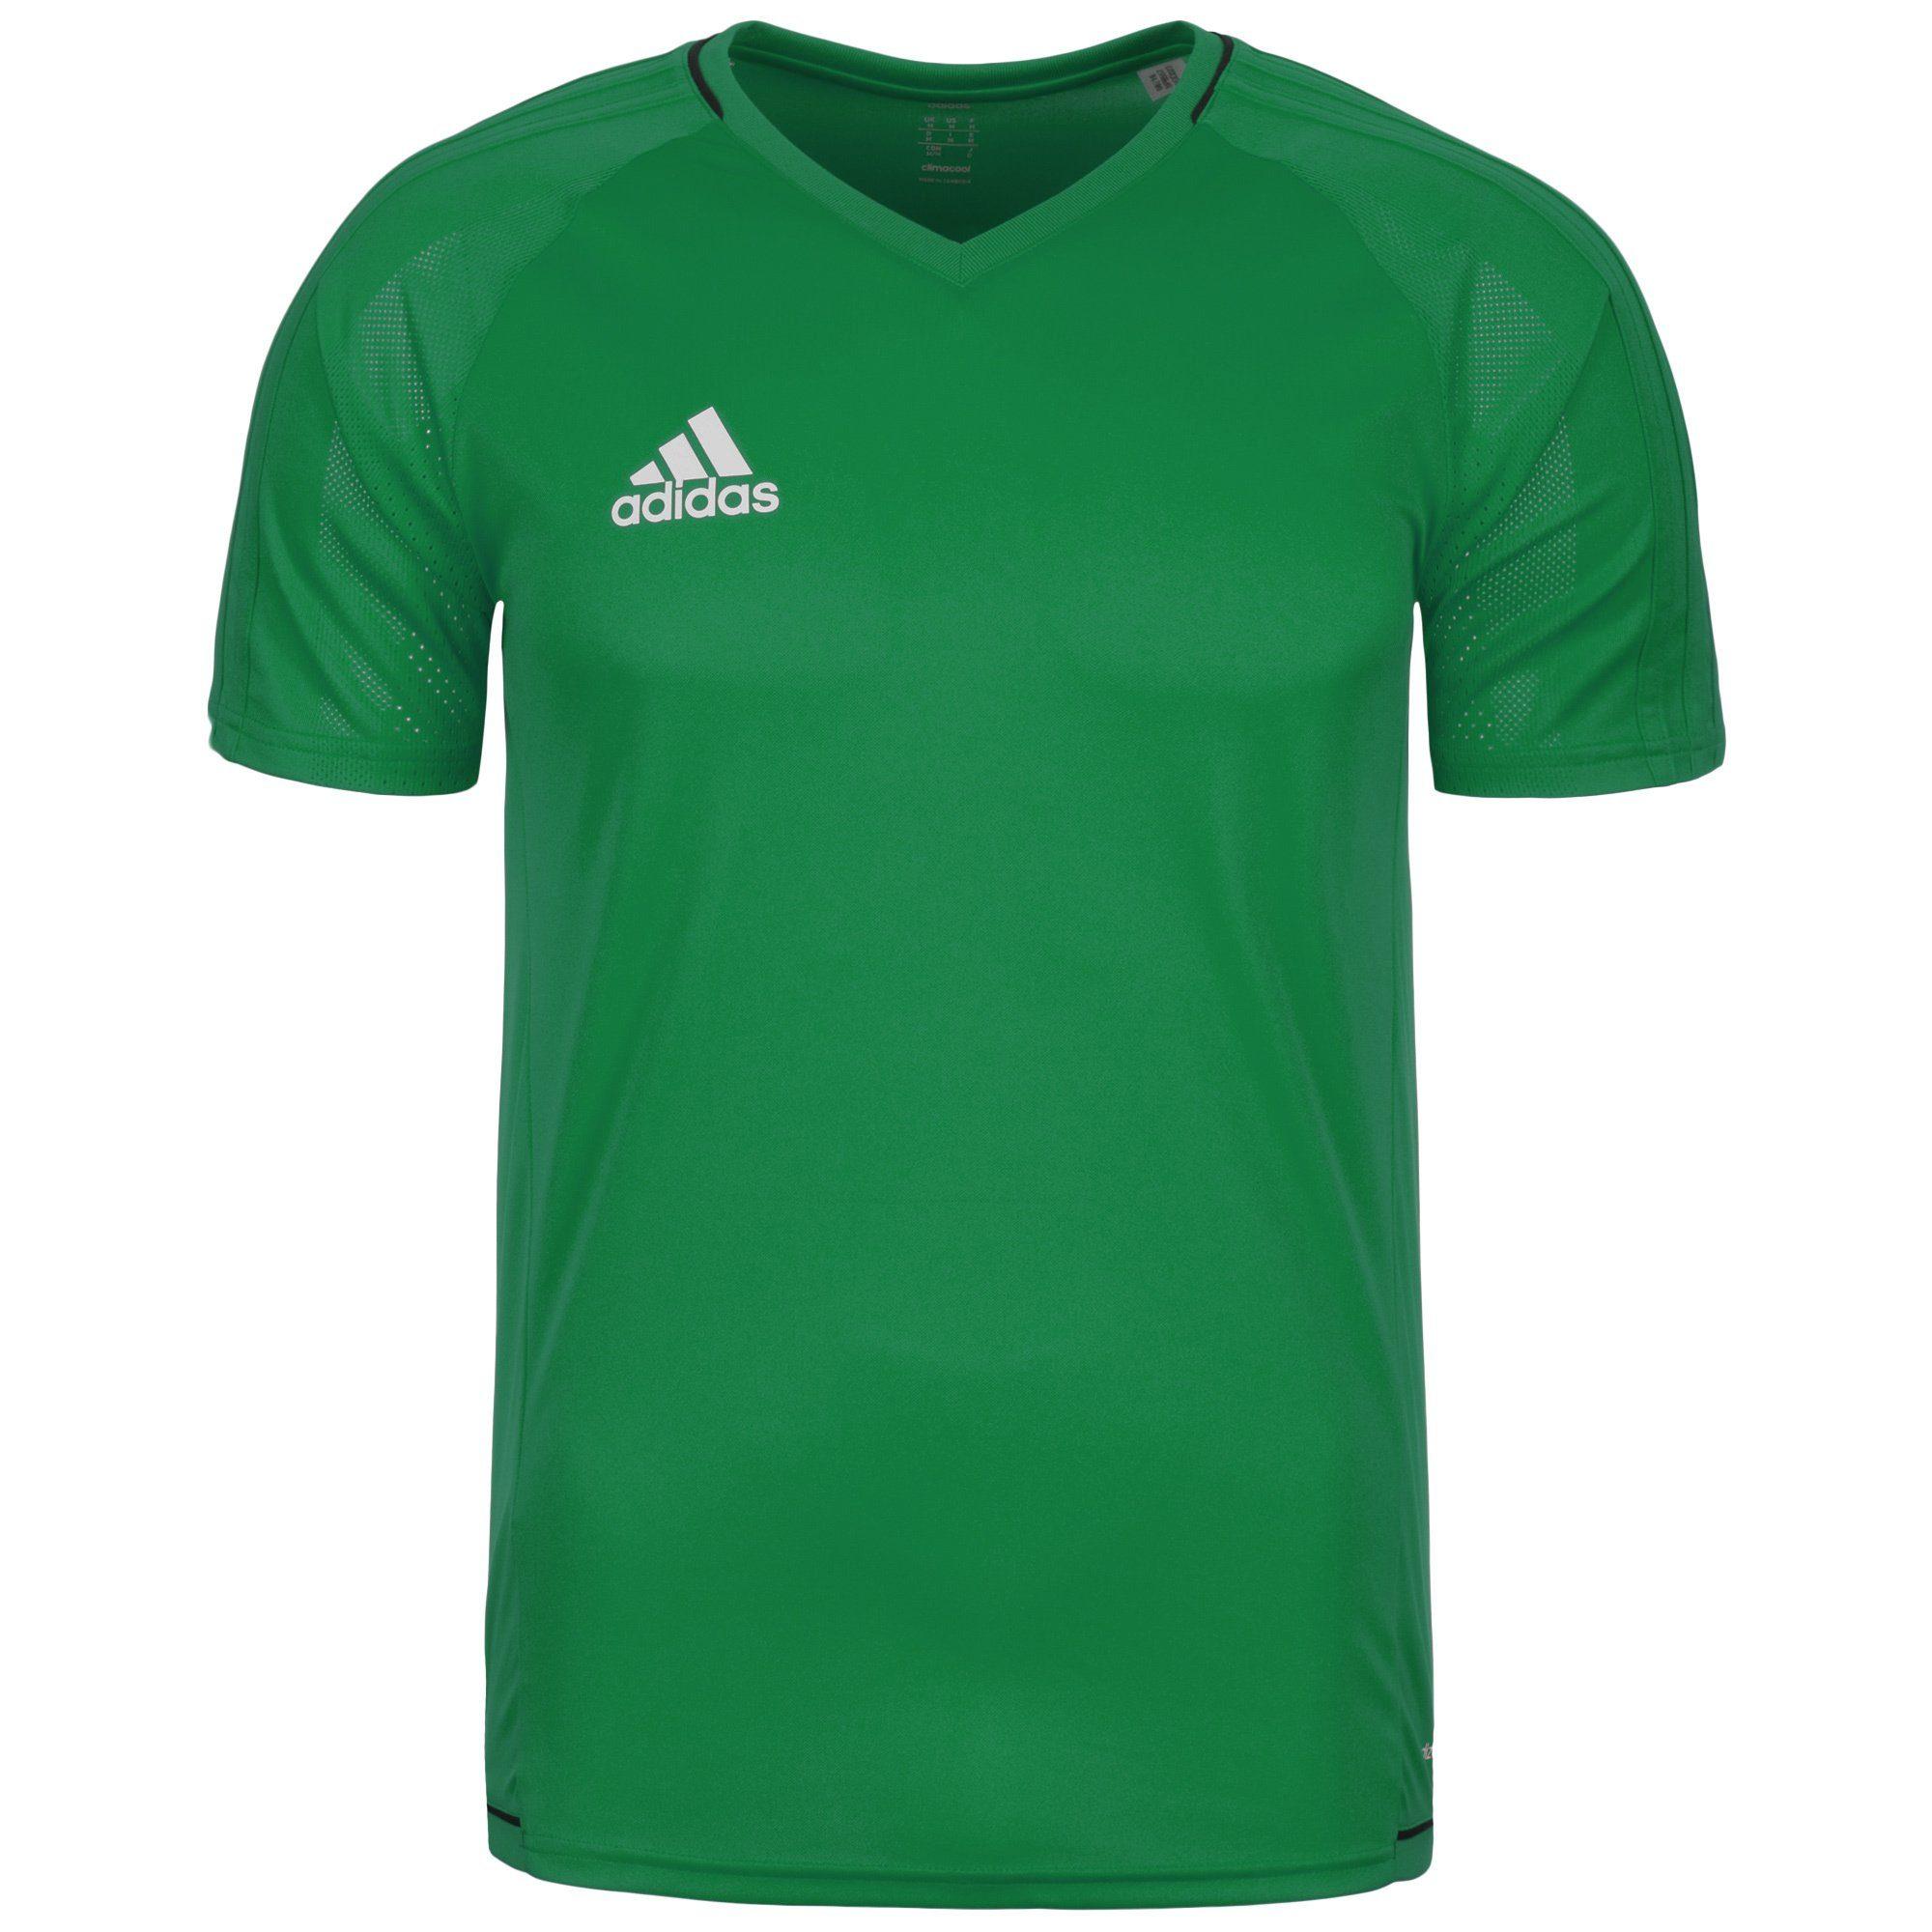 adidas Performance Trainingsshirt Tiro 17 | Sportbekleidung > Sportshirts > Funktionsshirts | adidas performance